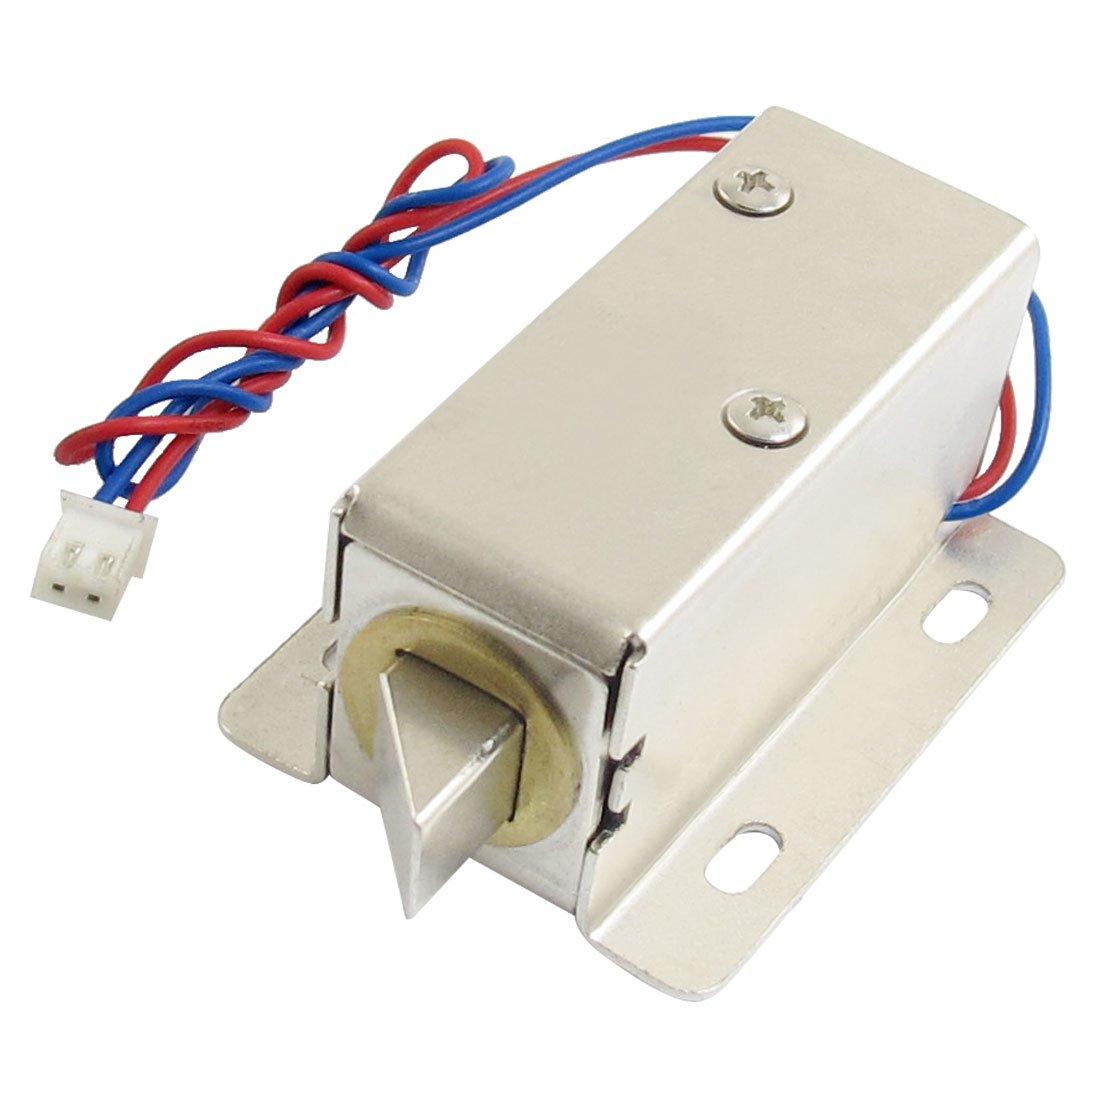 CLOS 0837L DC 12V 8W Open Frame Type Solenoid for Electric Door Lock dc 12v open frame type electronic door lock 12v 2a for cabinet locks solenoid locks drawer